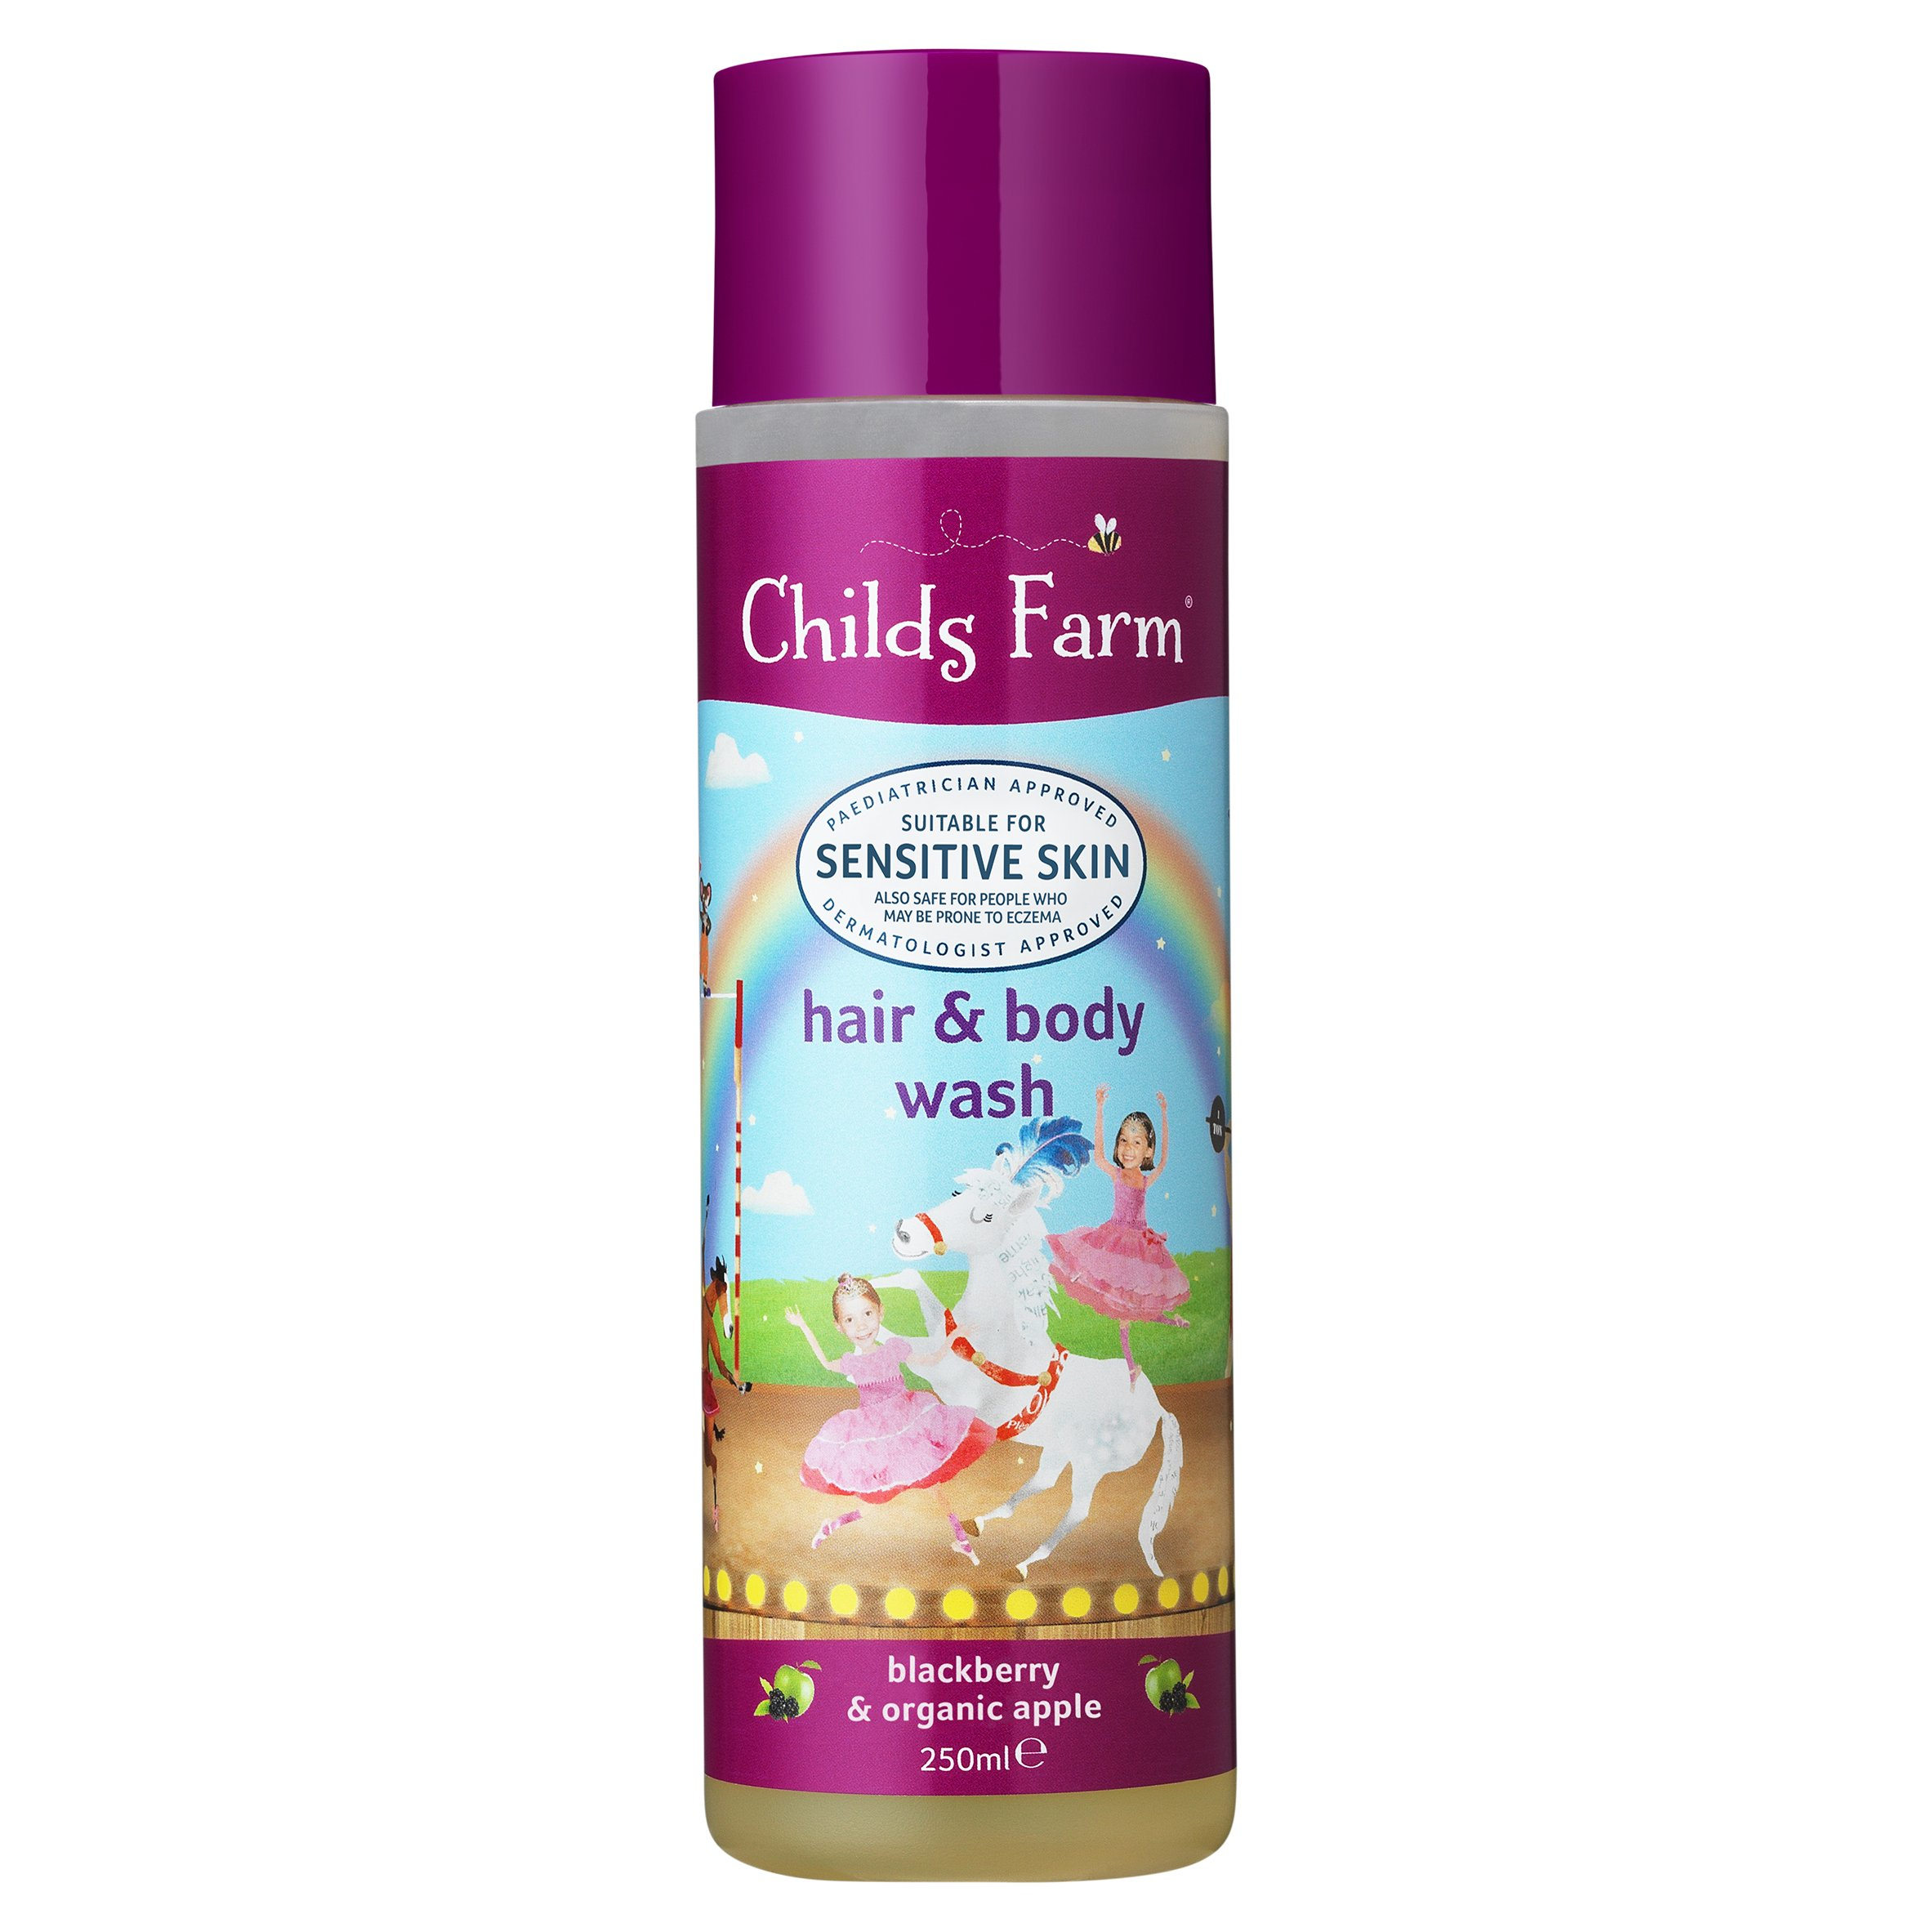 Childs Farm Blackberry & Apple Body Wash 250Ml